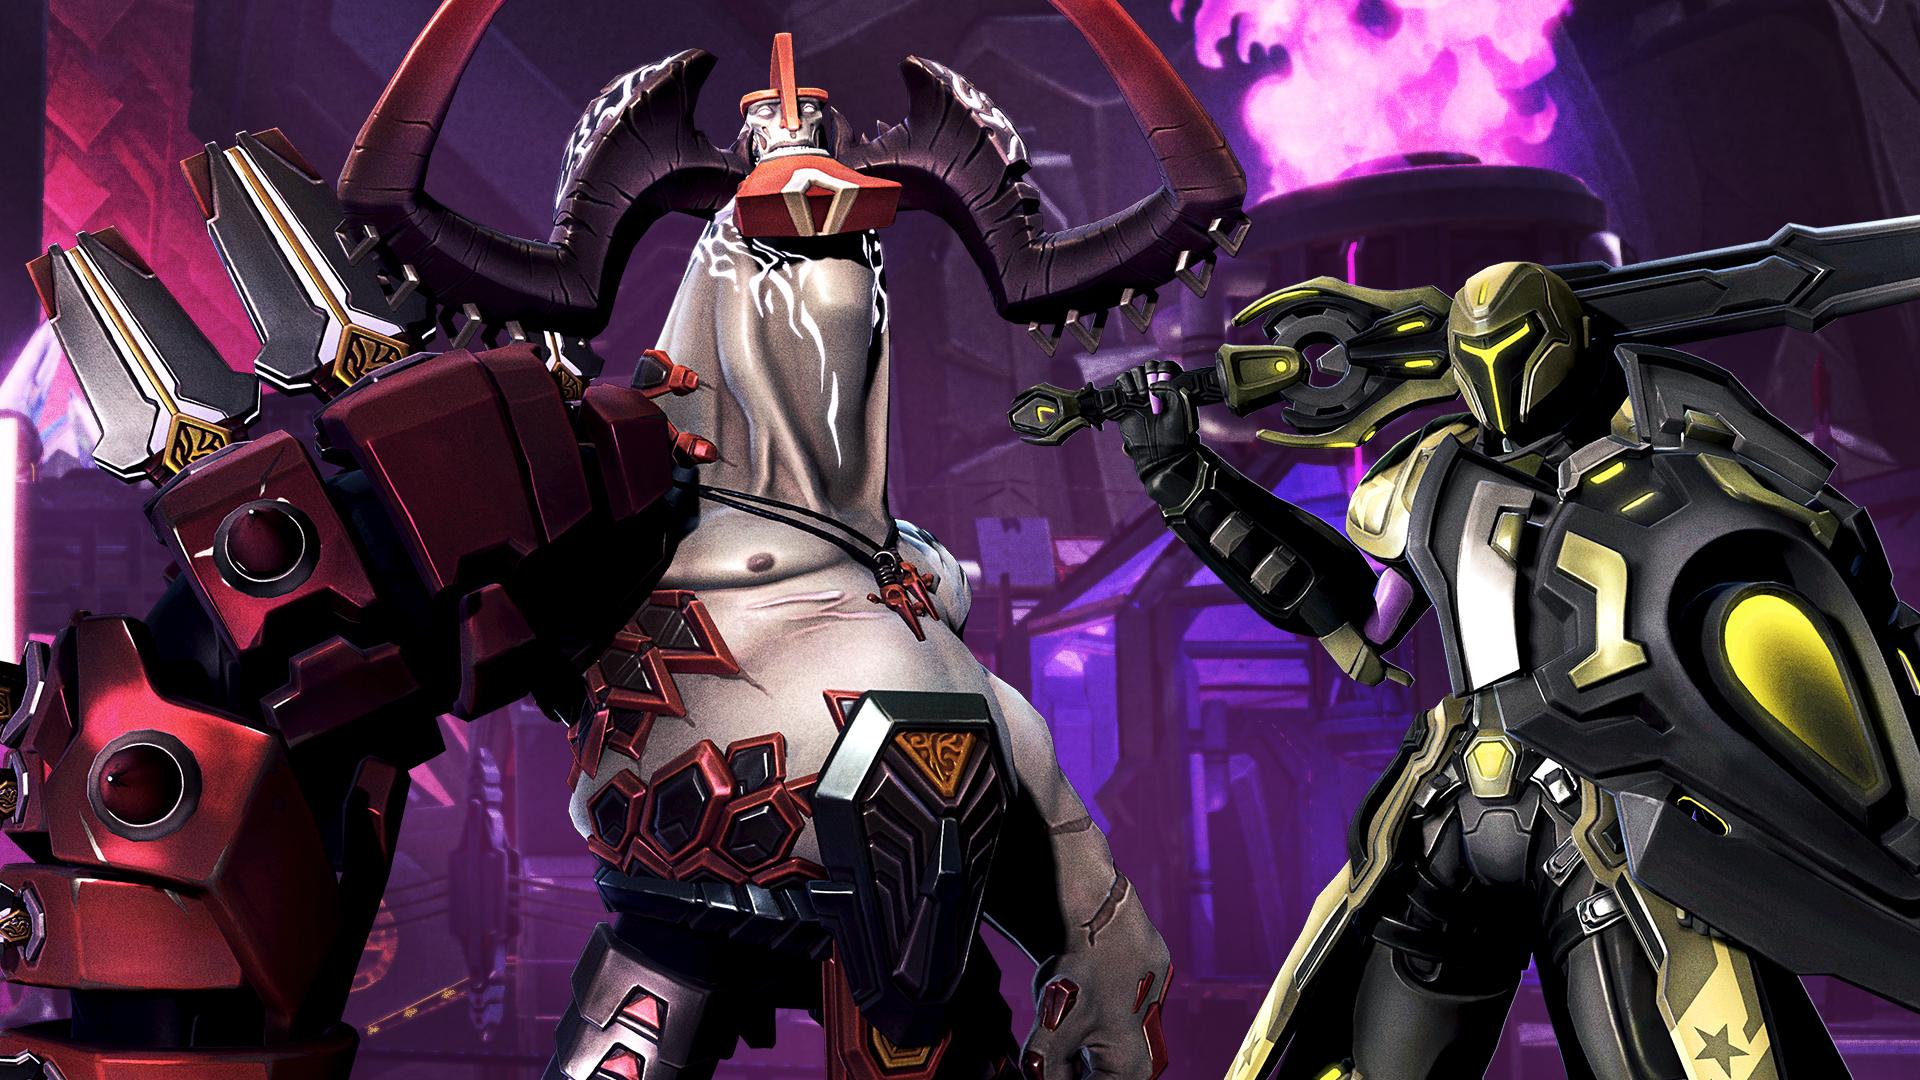 New Battleborn Characters Announced